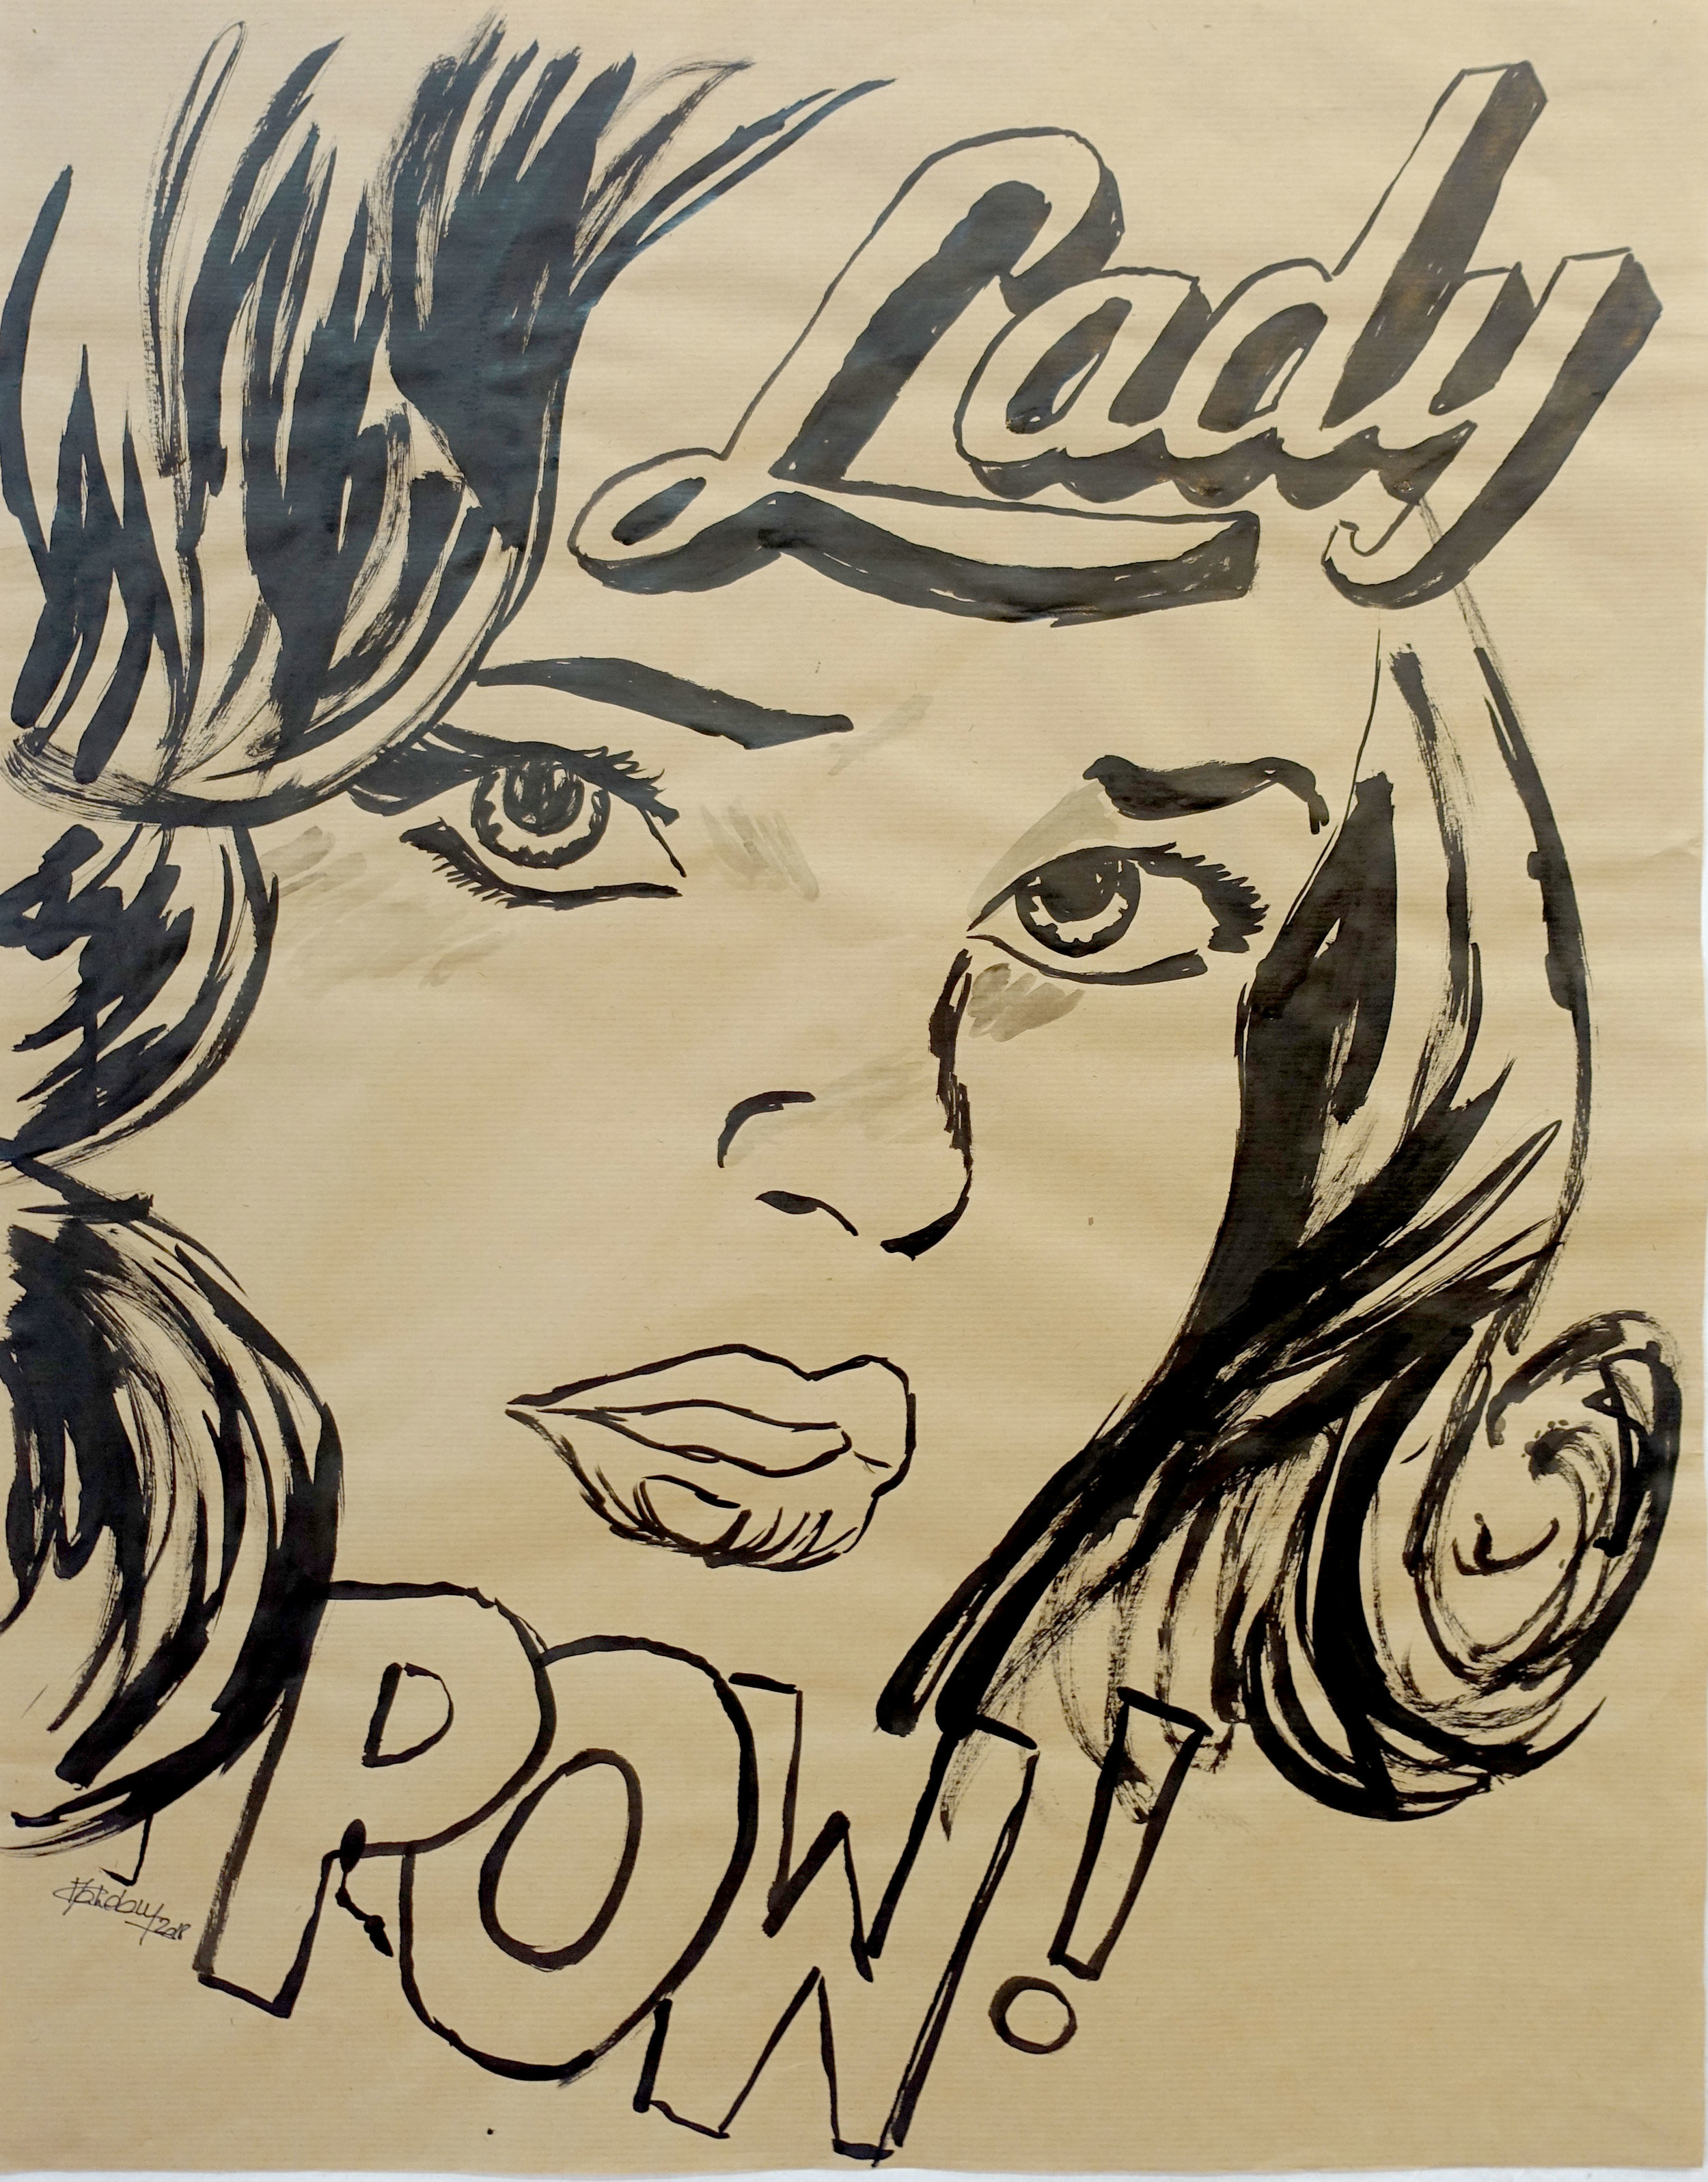 CHARLOTTE MAHDAVY_LADYSPOW DRAWING LADY 5_0.jpg